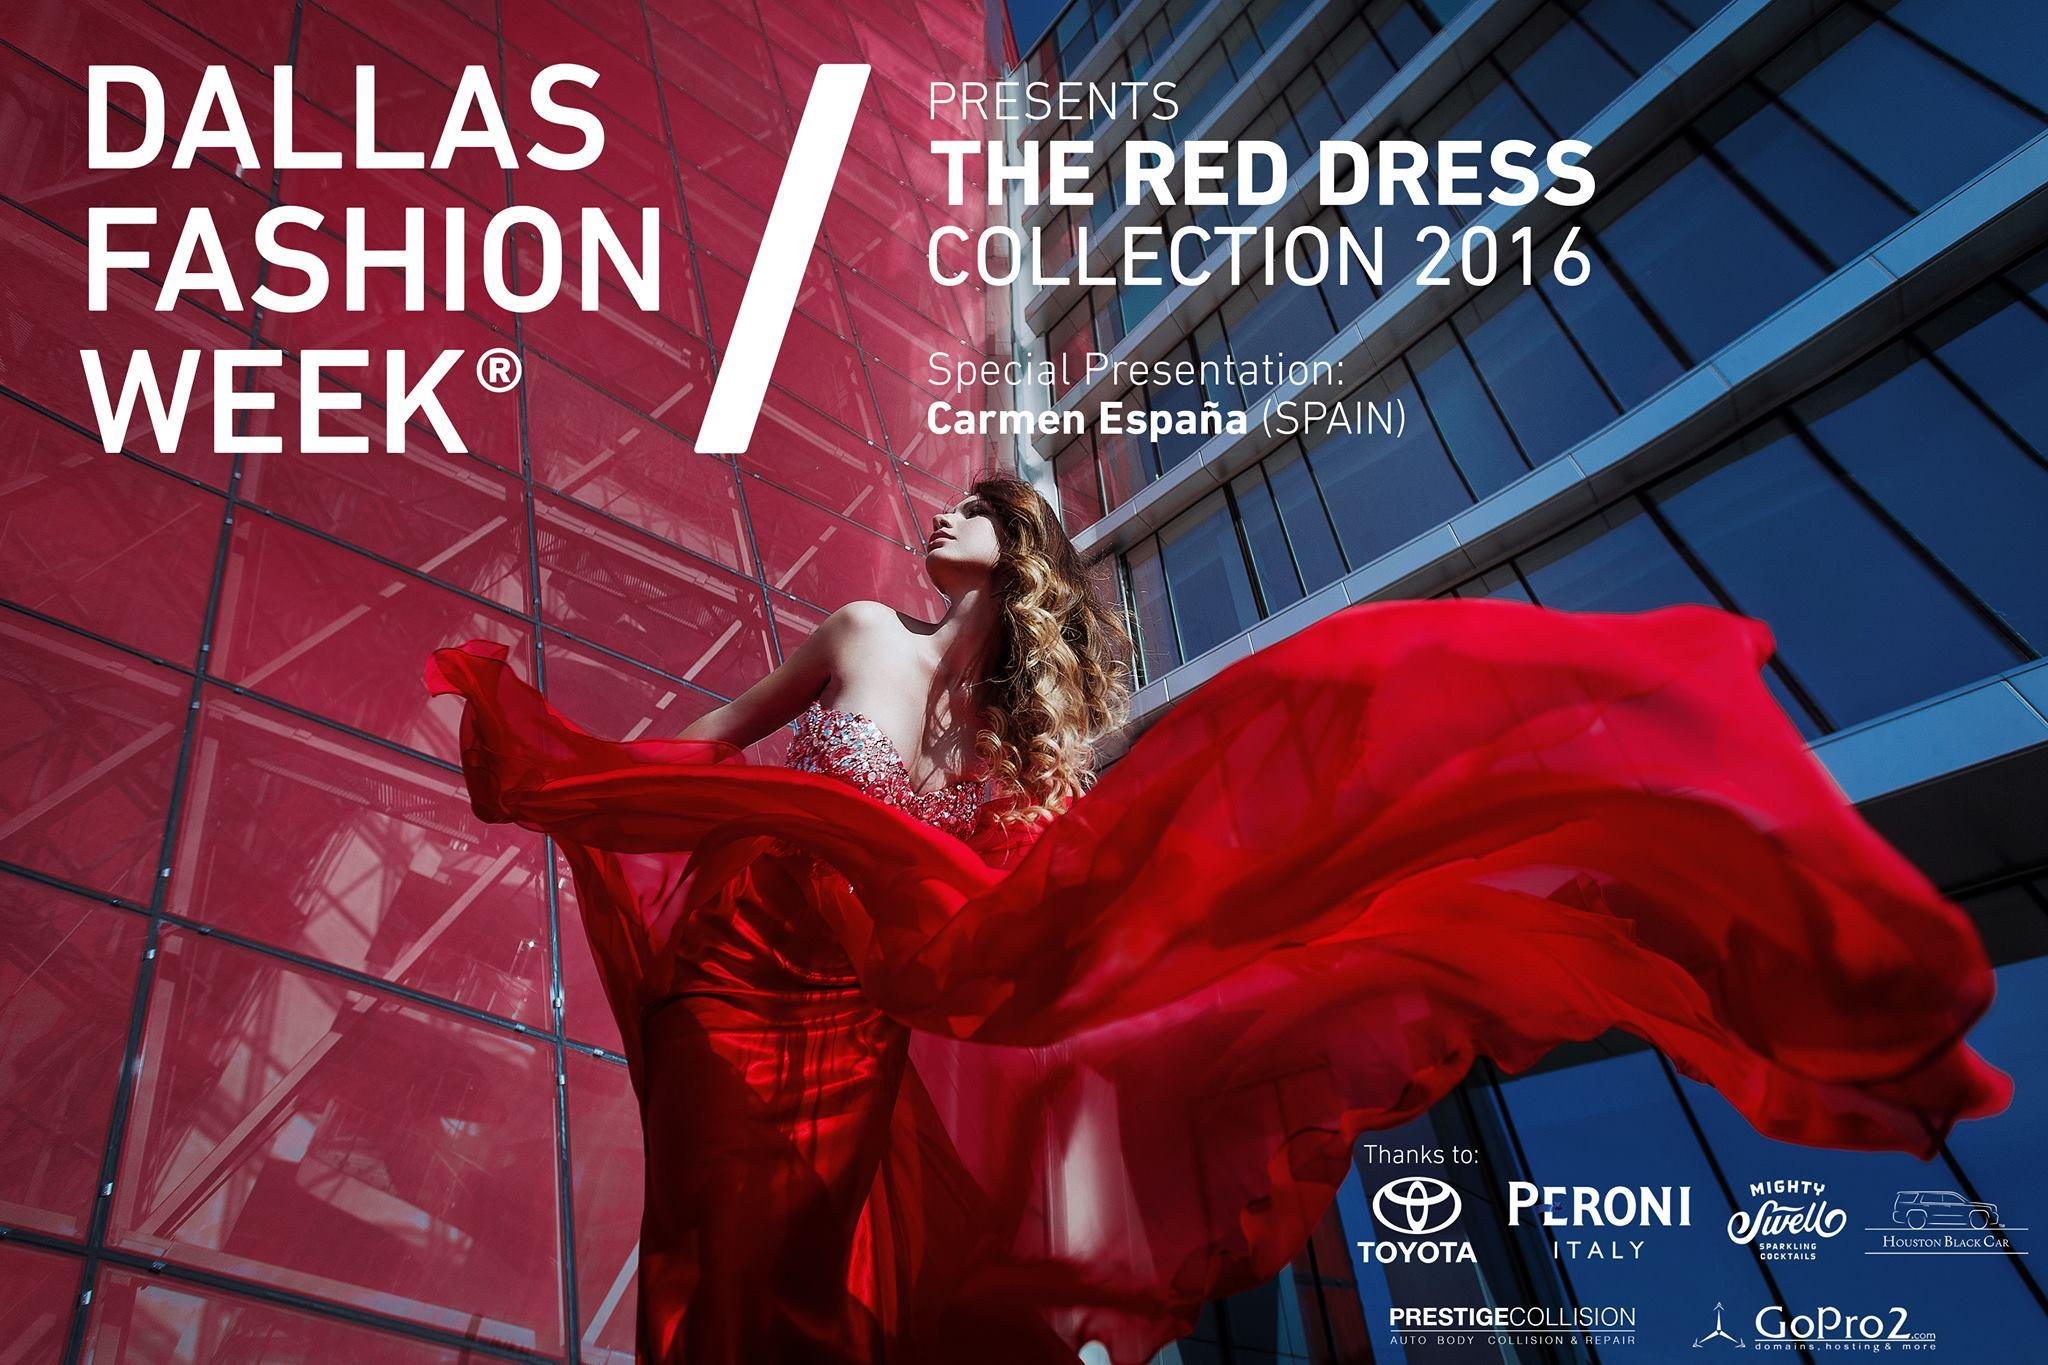 DALLAS FASHION WEEK®  Red Dress Collection Fashion Show 2017